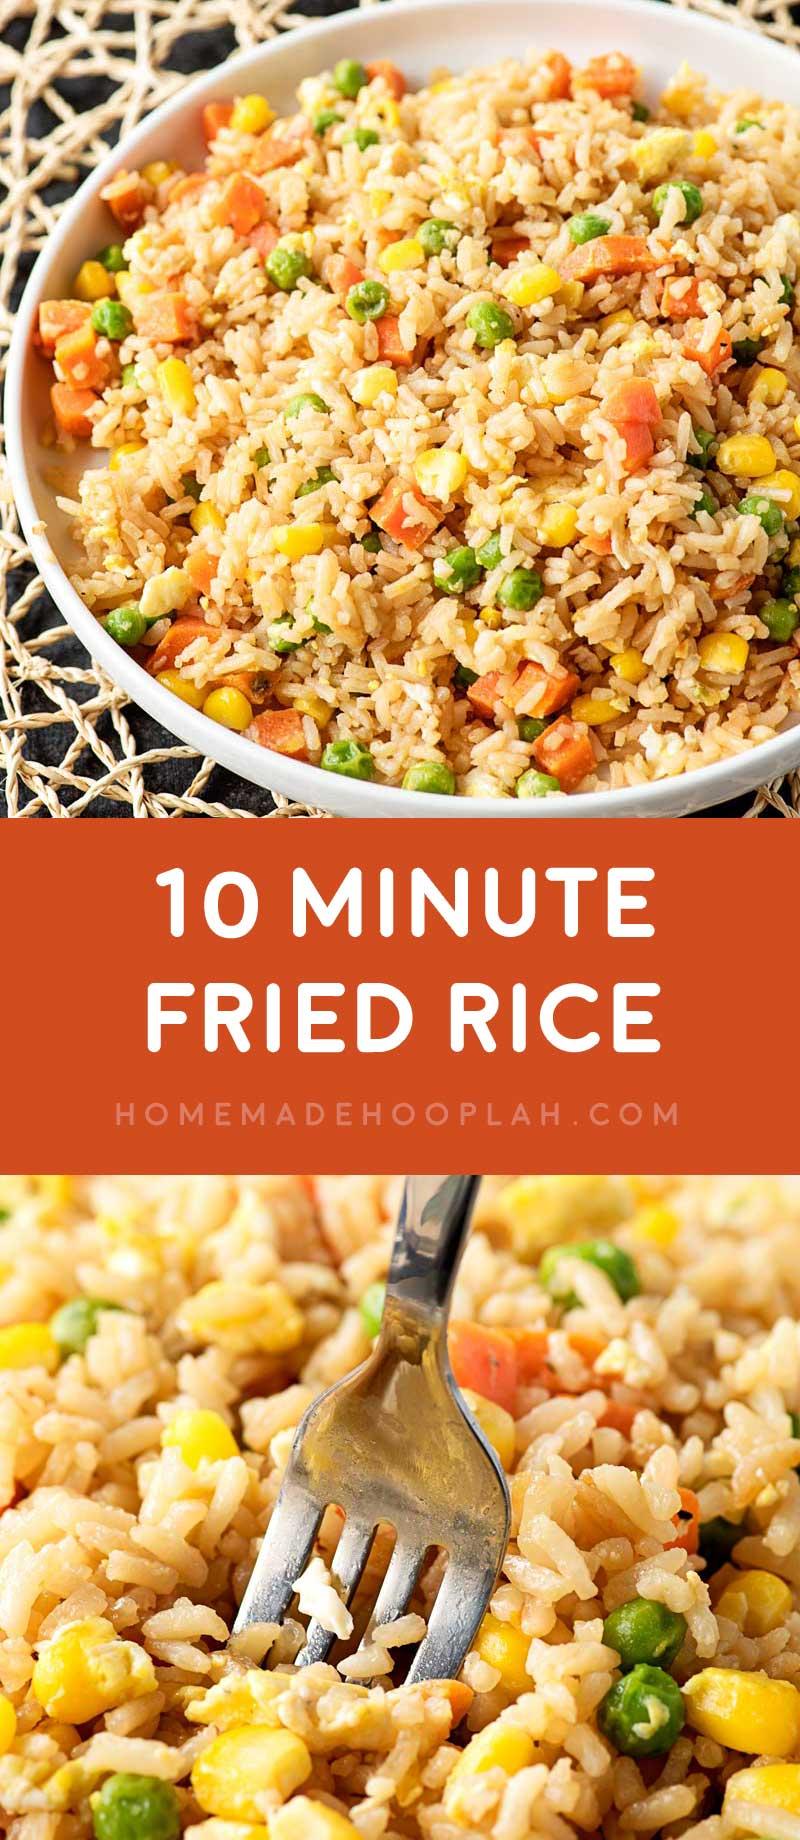 10 Minute Simple Egg Fried Rice - Homemade Hooplah